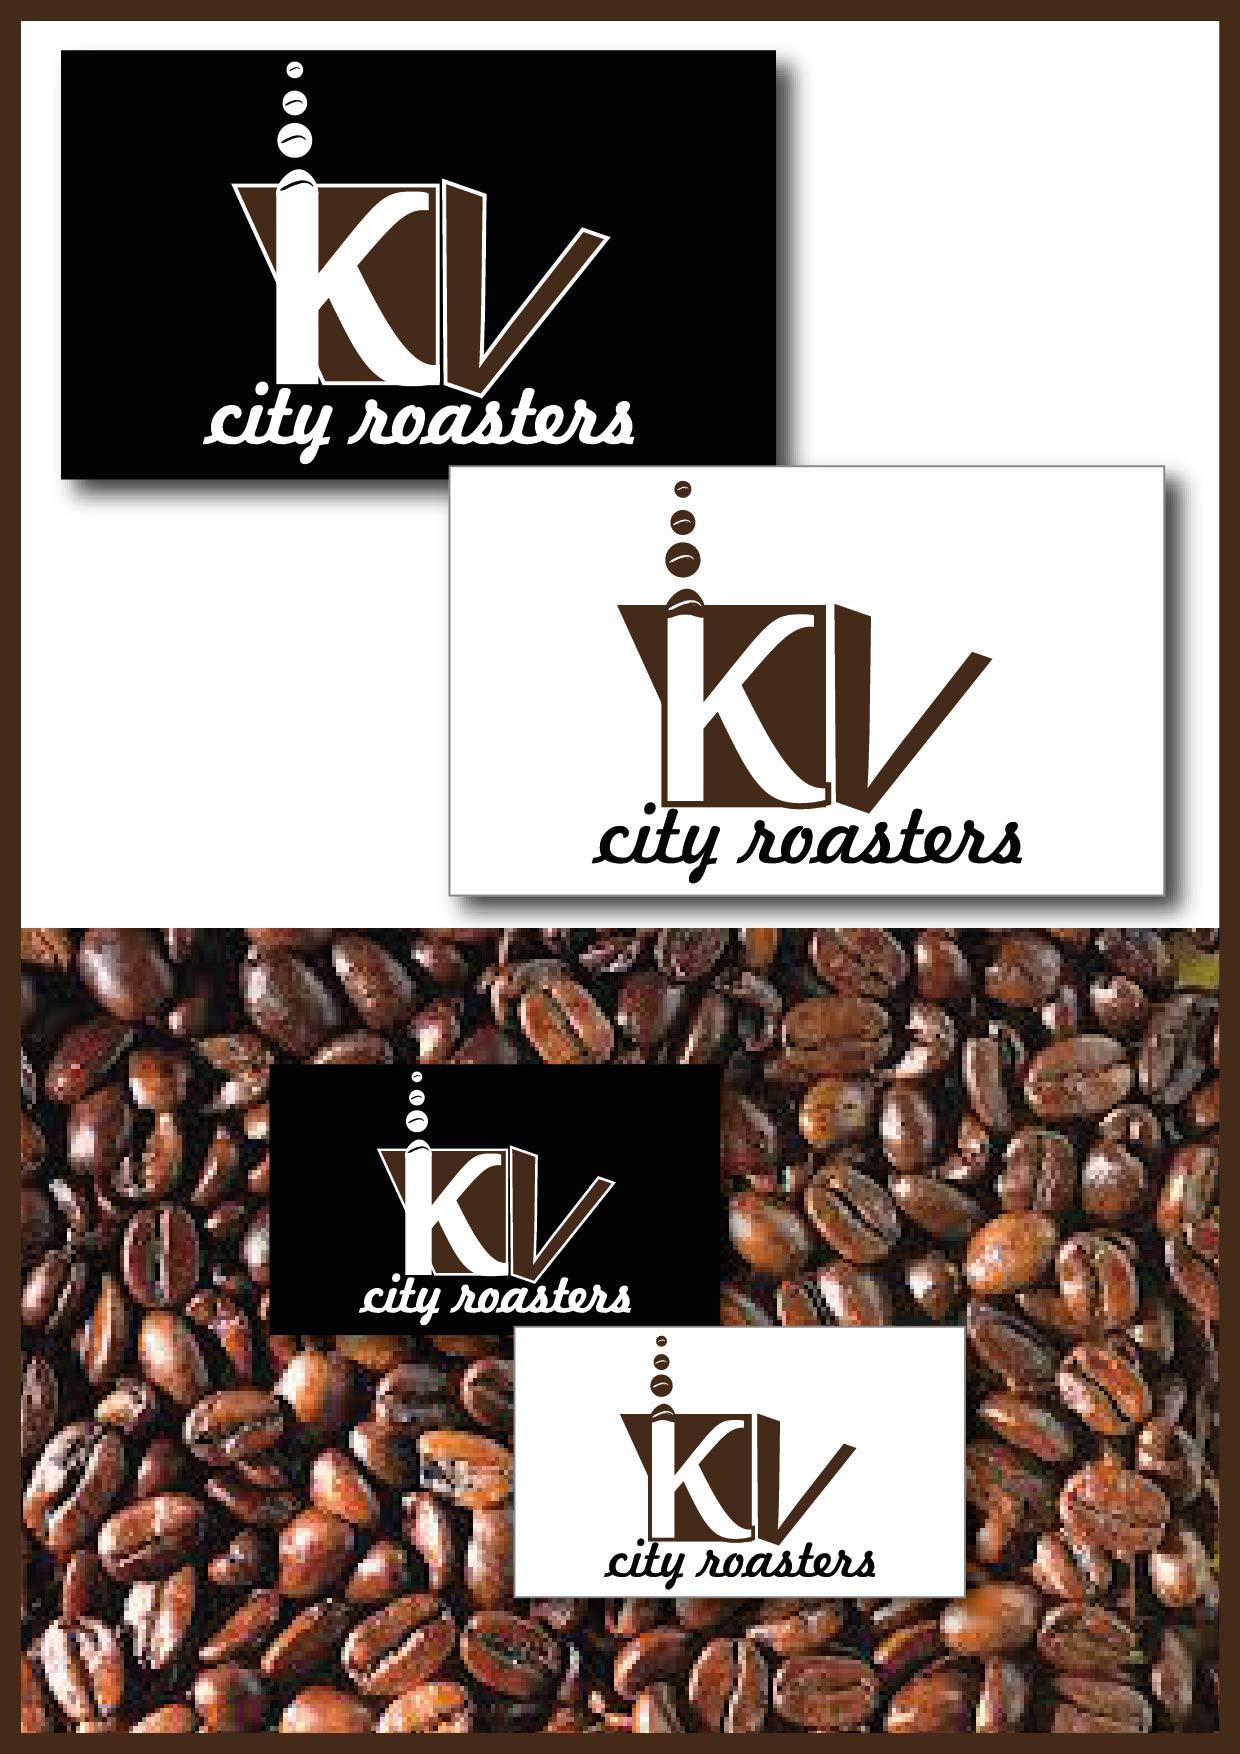 логотип для кофейной компании фото f_831541b0c9abcbd7.jpg